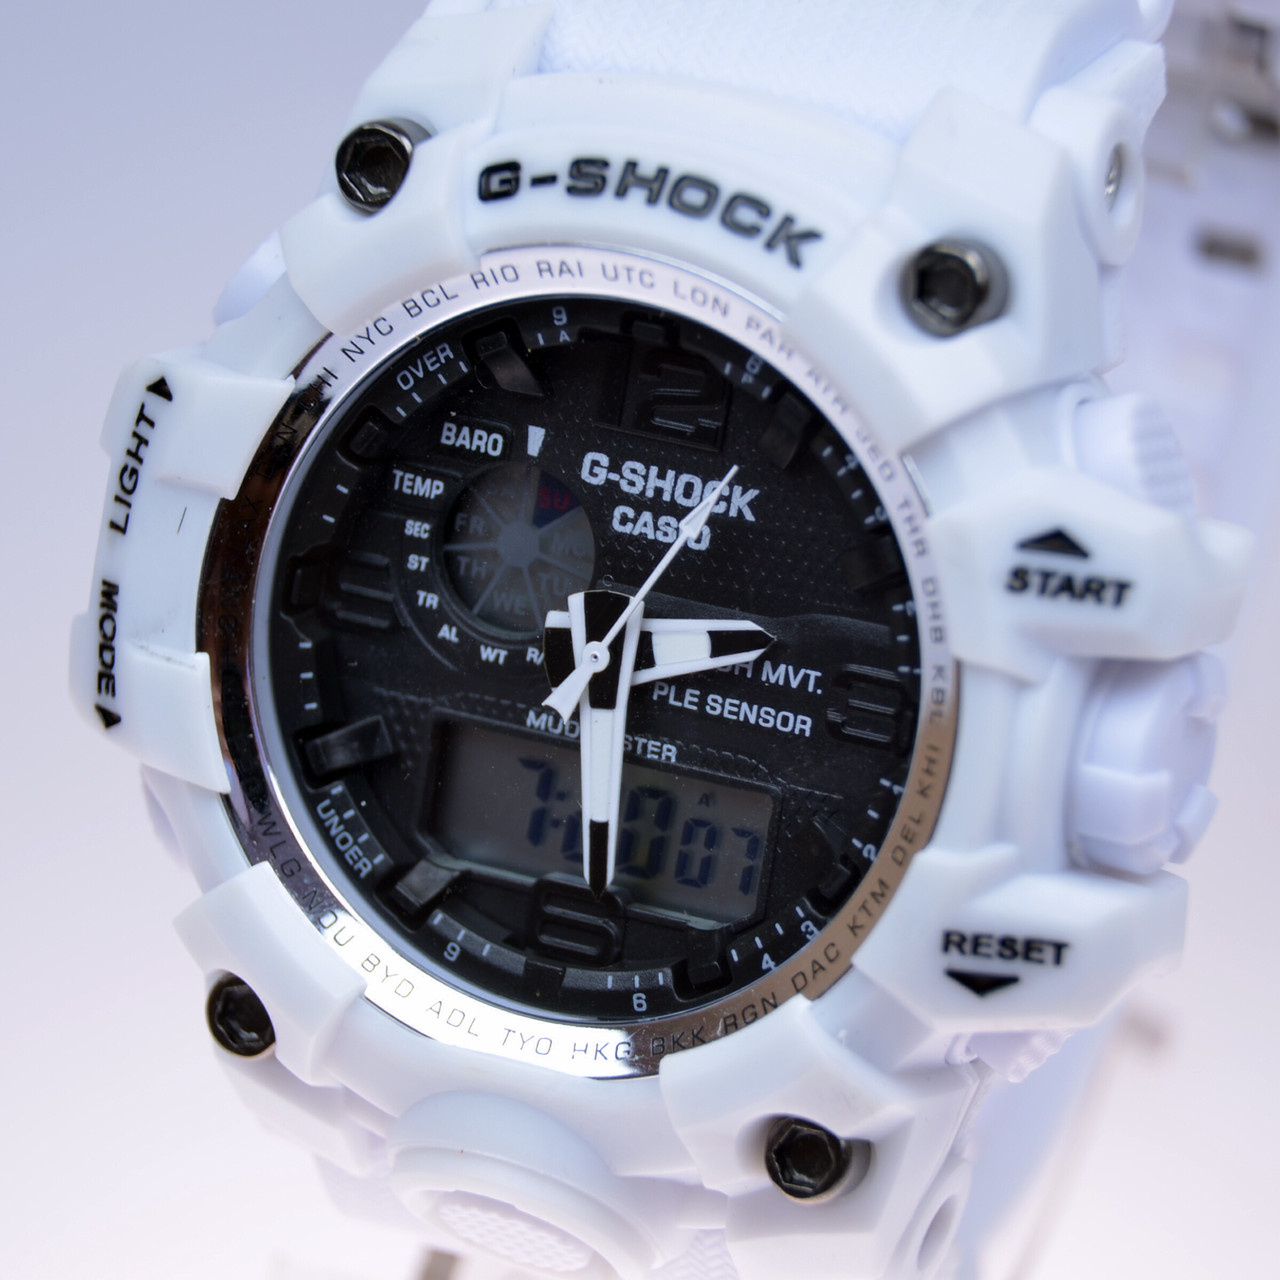 a54bd7b0 Наручные часы Casio G-SHOCK CPW-1000 (копия): продажа, цена в ...